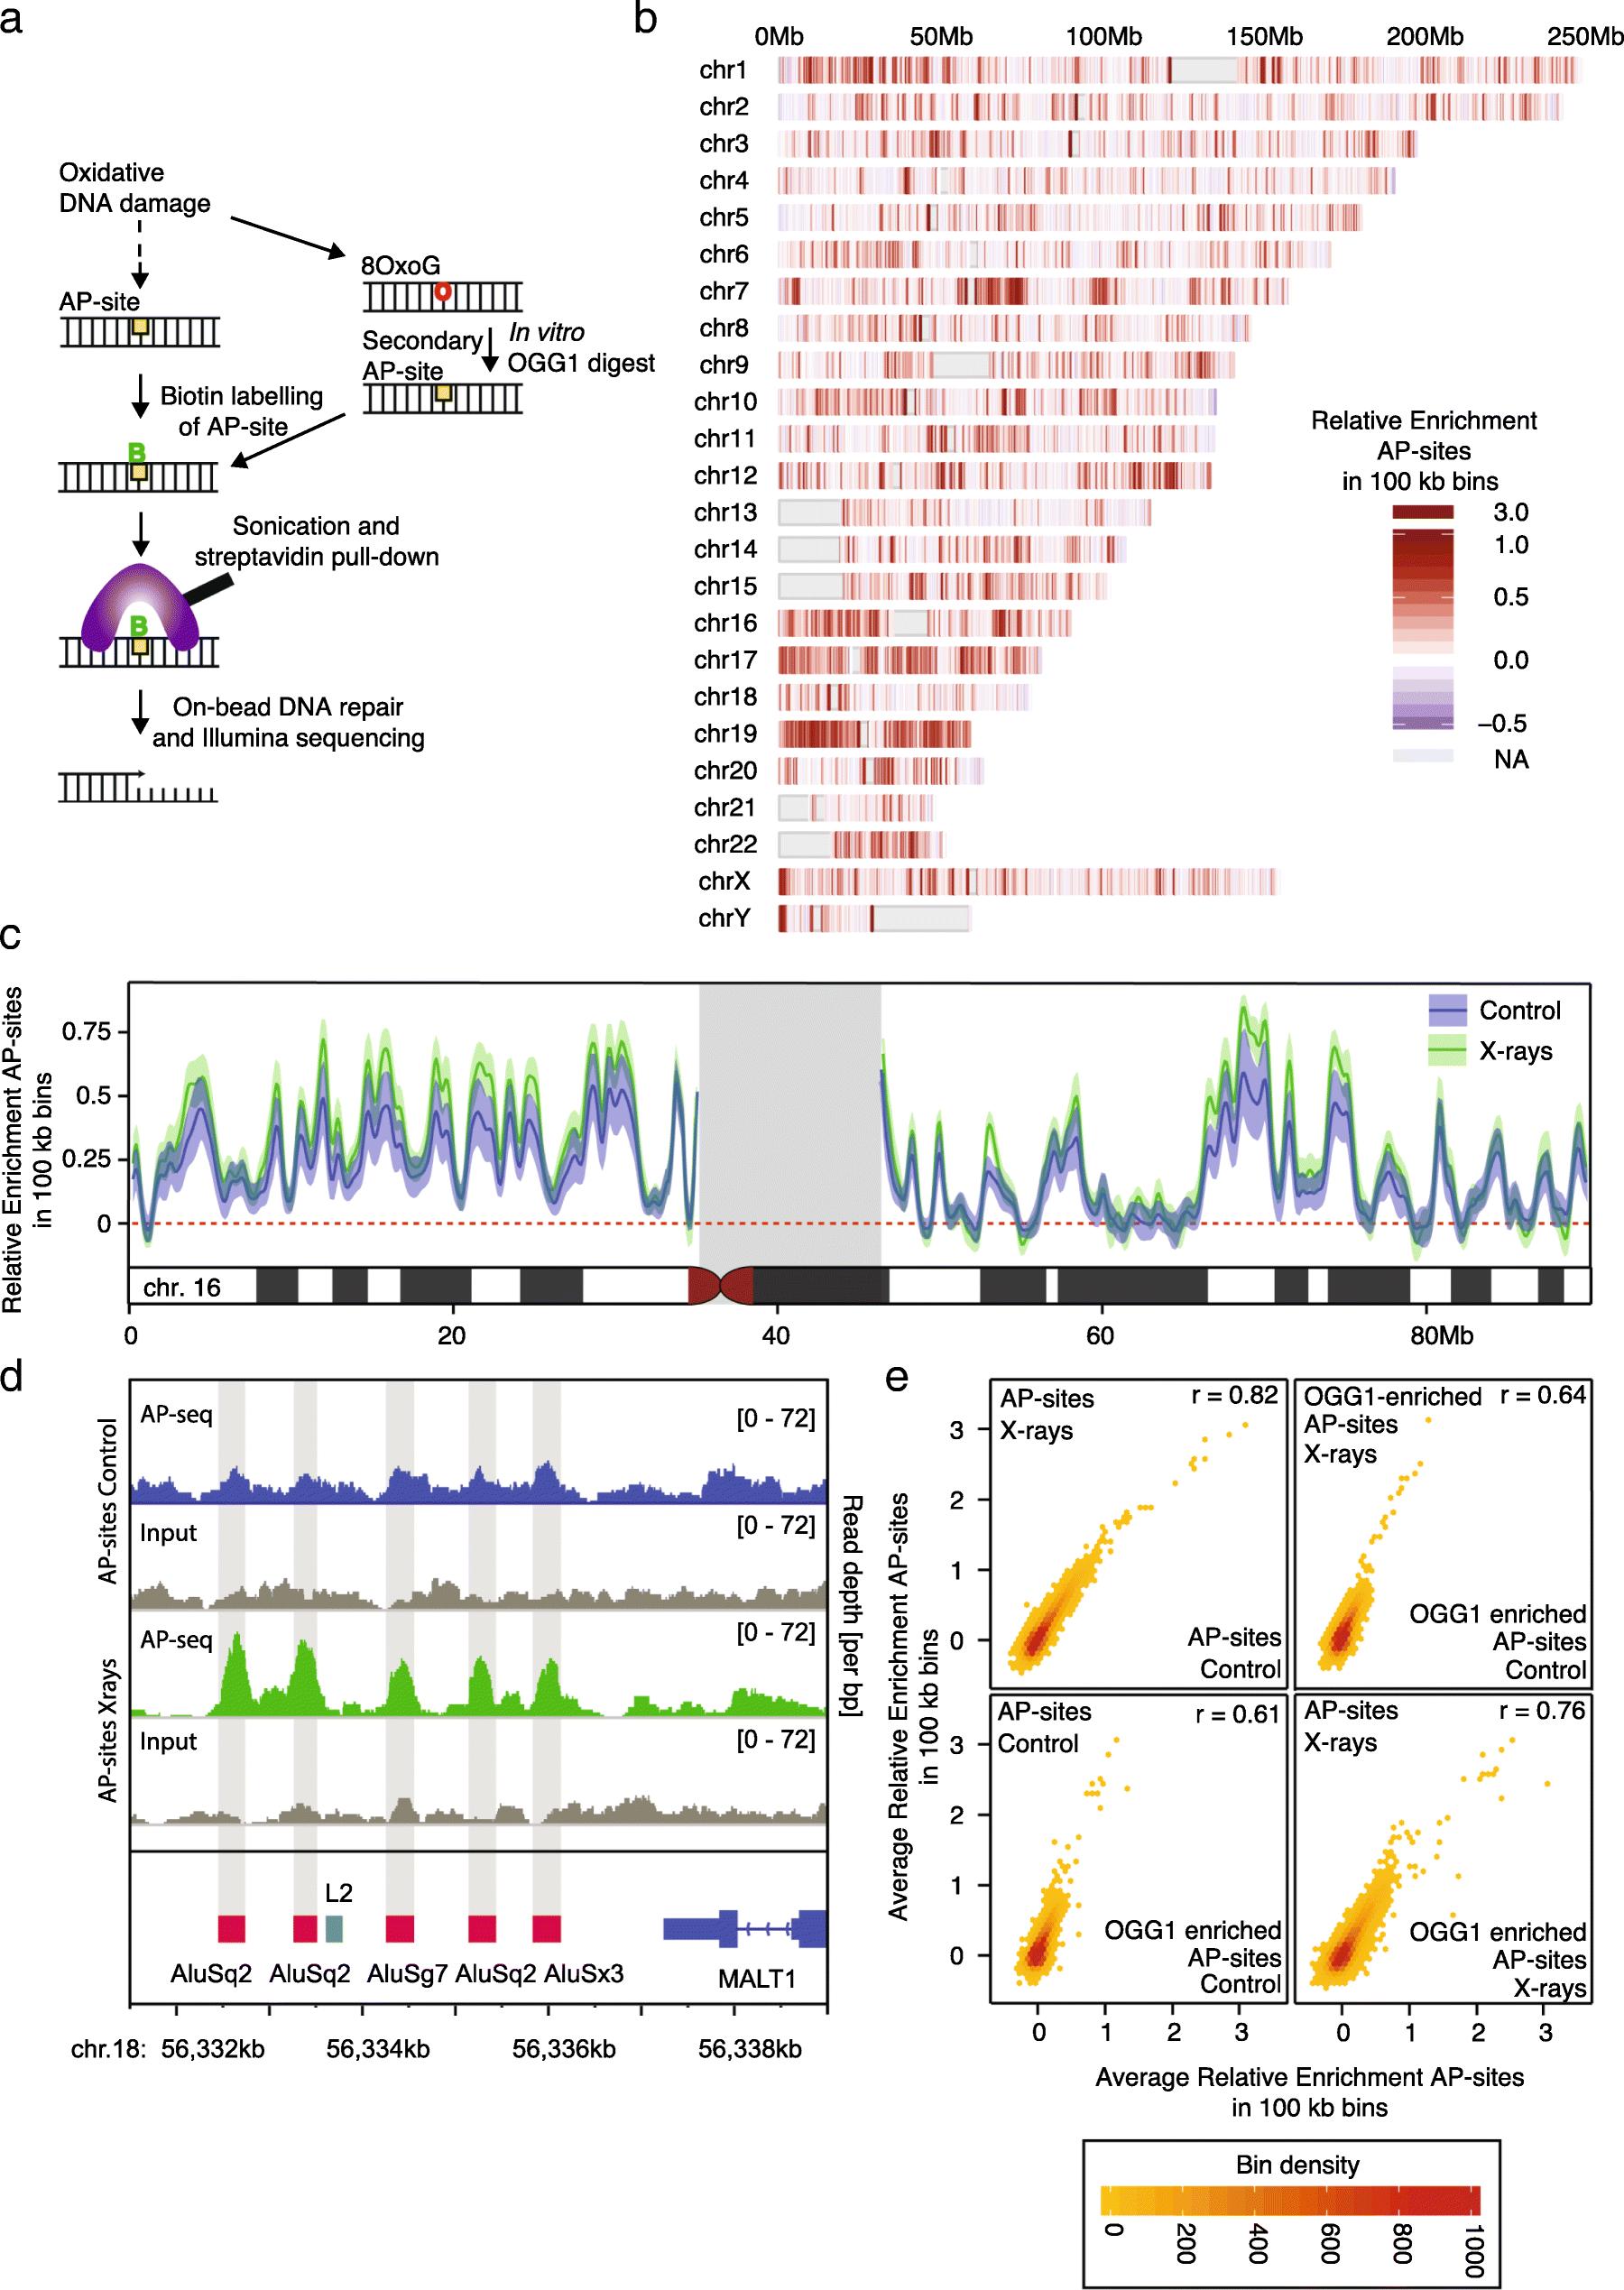 Genomic landscape of oxidative DNA damage and repair reveals